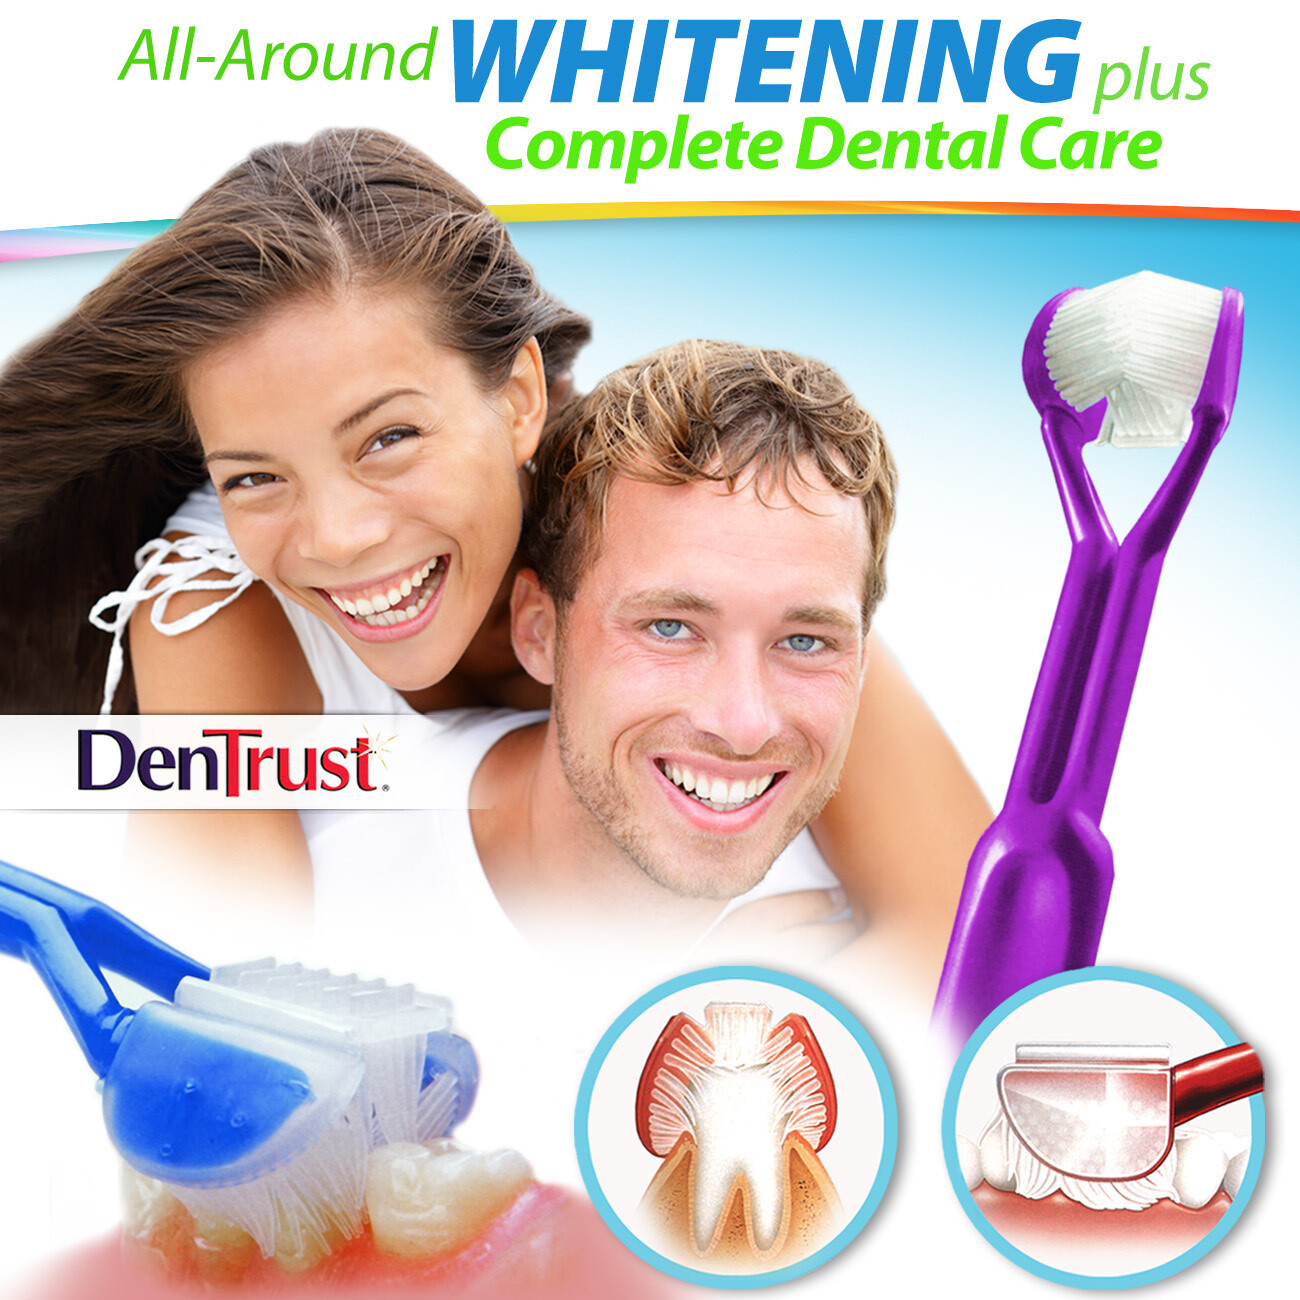 DenTrust WHITE-ON 3-Sided Whitening Toothpaste Applicator :: Easily & Evenly Apply Whitener's - Plus, Provide Complete Dental Care at the Same Time